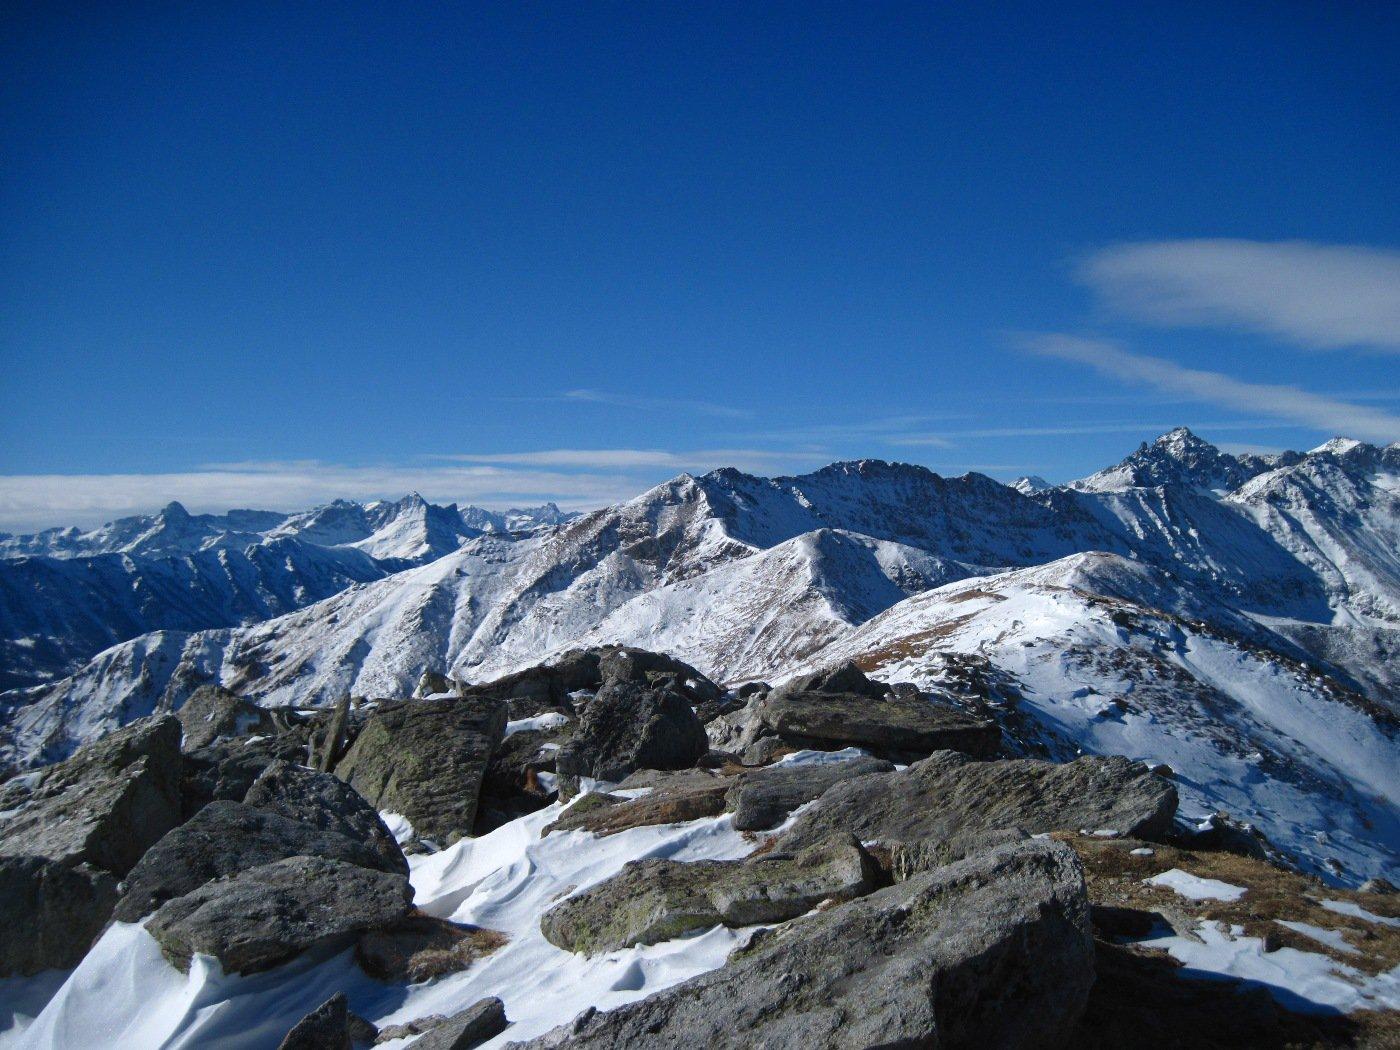 Panorama sulle montagne cuneesi